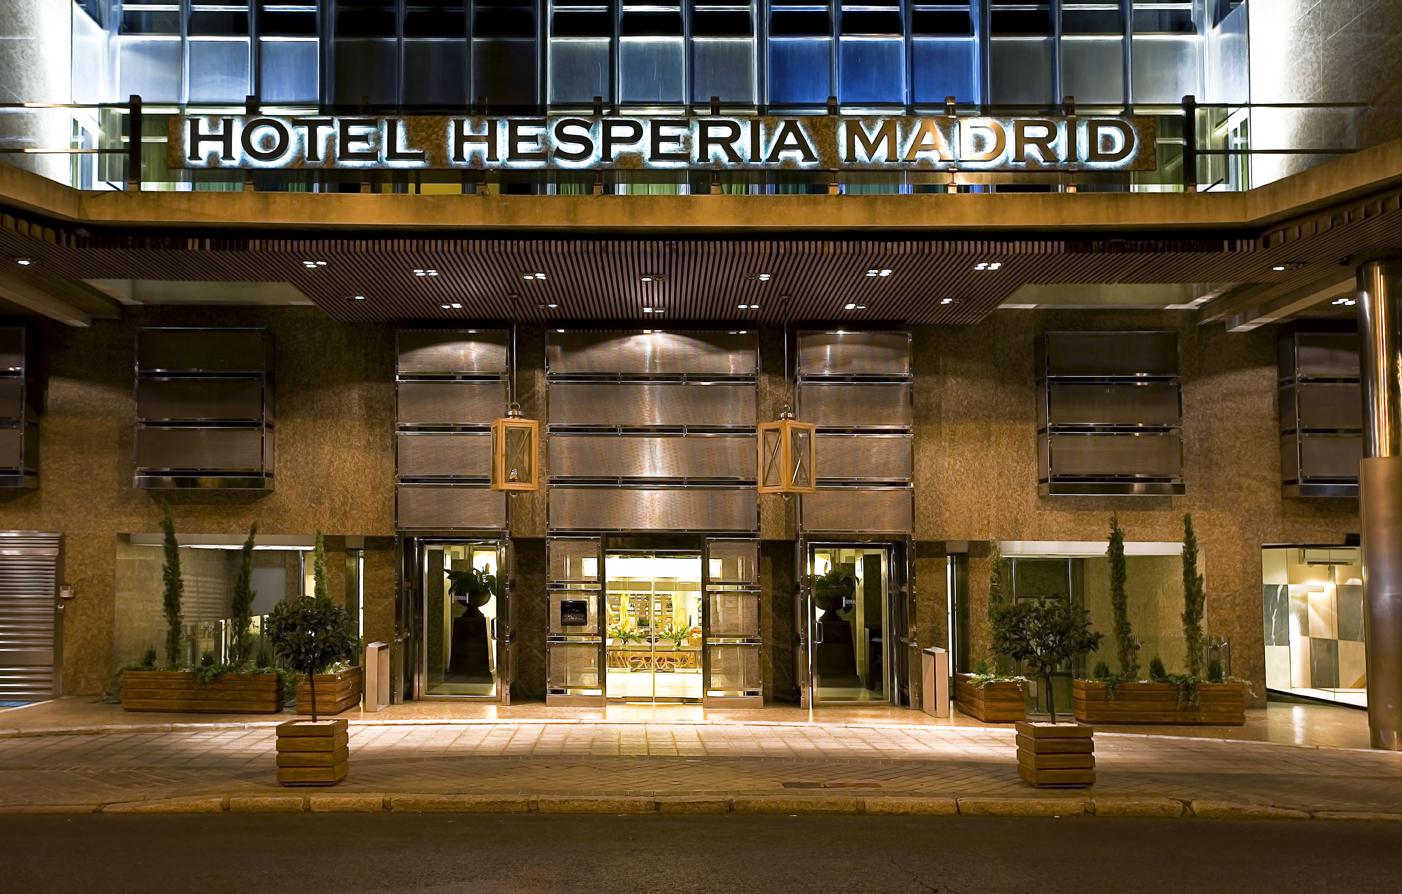 Luxury madrid hotel hesperia madrid luxury spain hotels for Hoteles chic en madrid